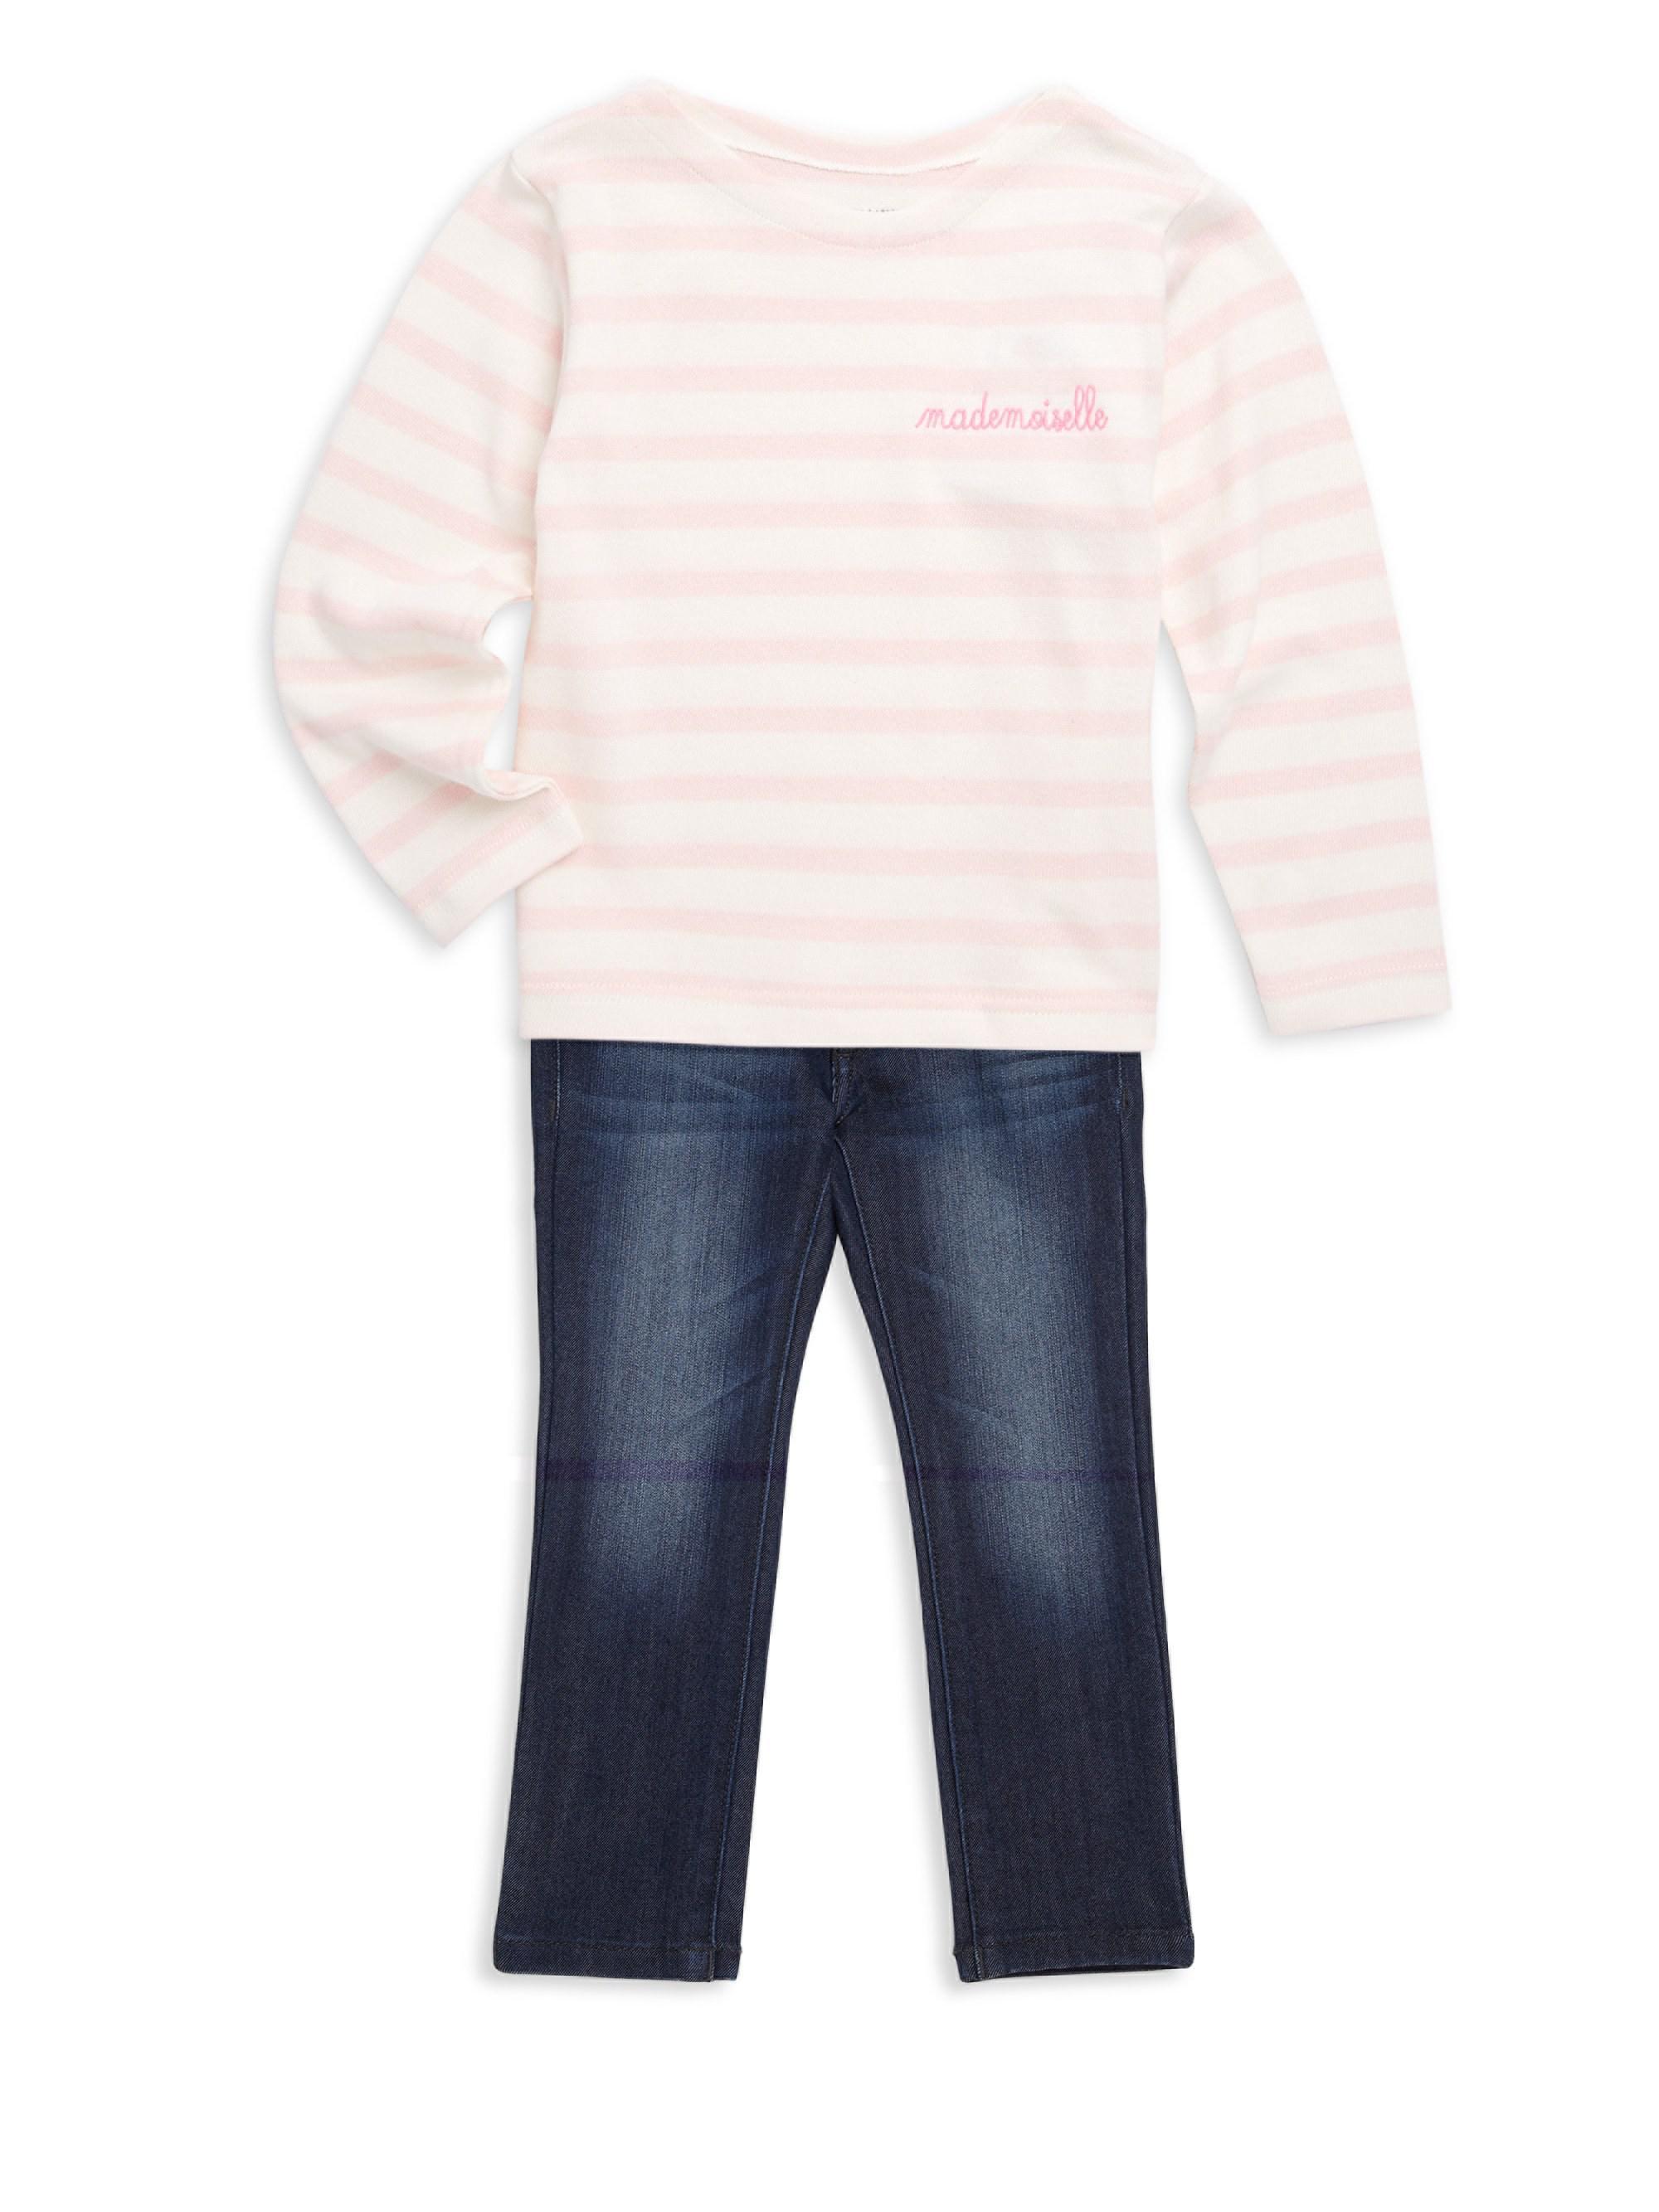 27a9504fe1b2 Maison Labiche Little Kid's & Kid's Sailor Tee in White for Men - Lyst